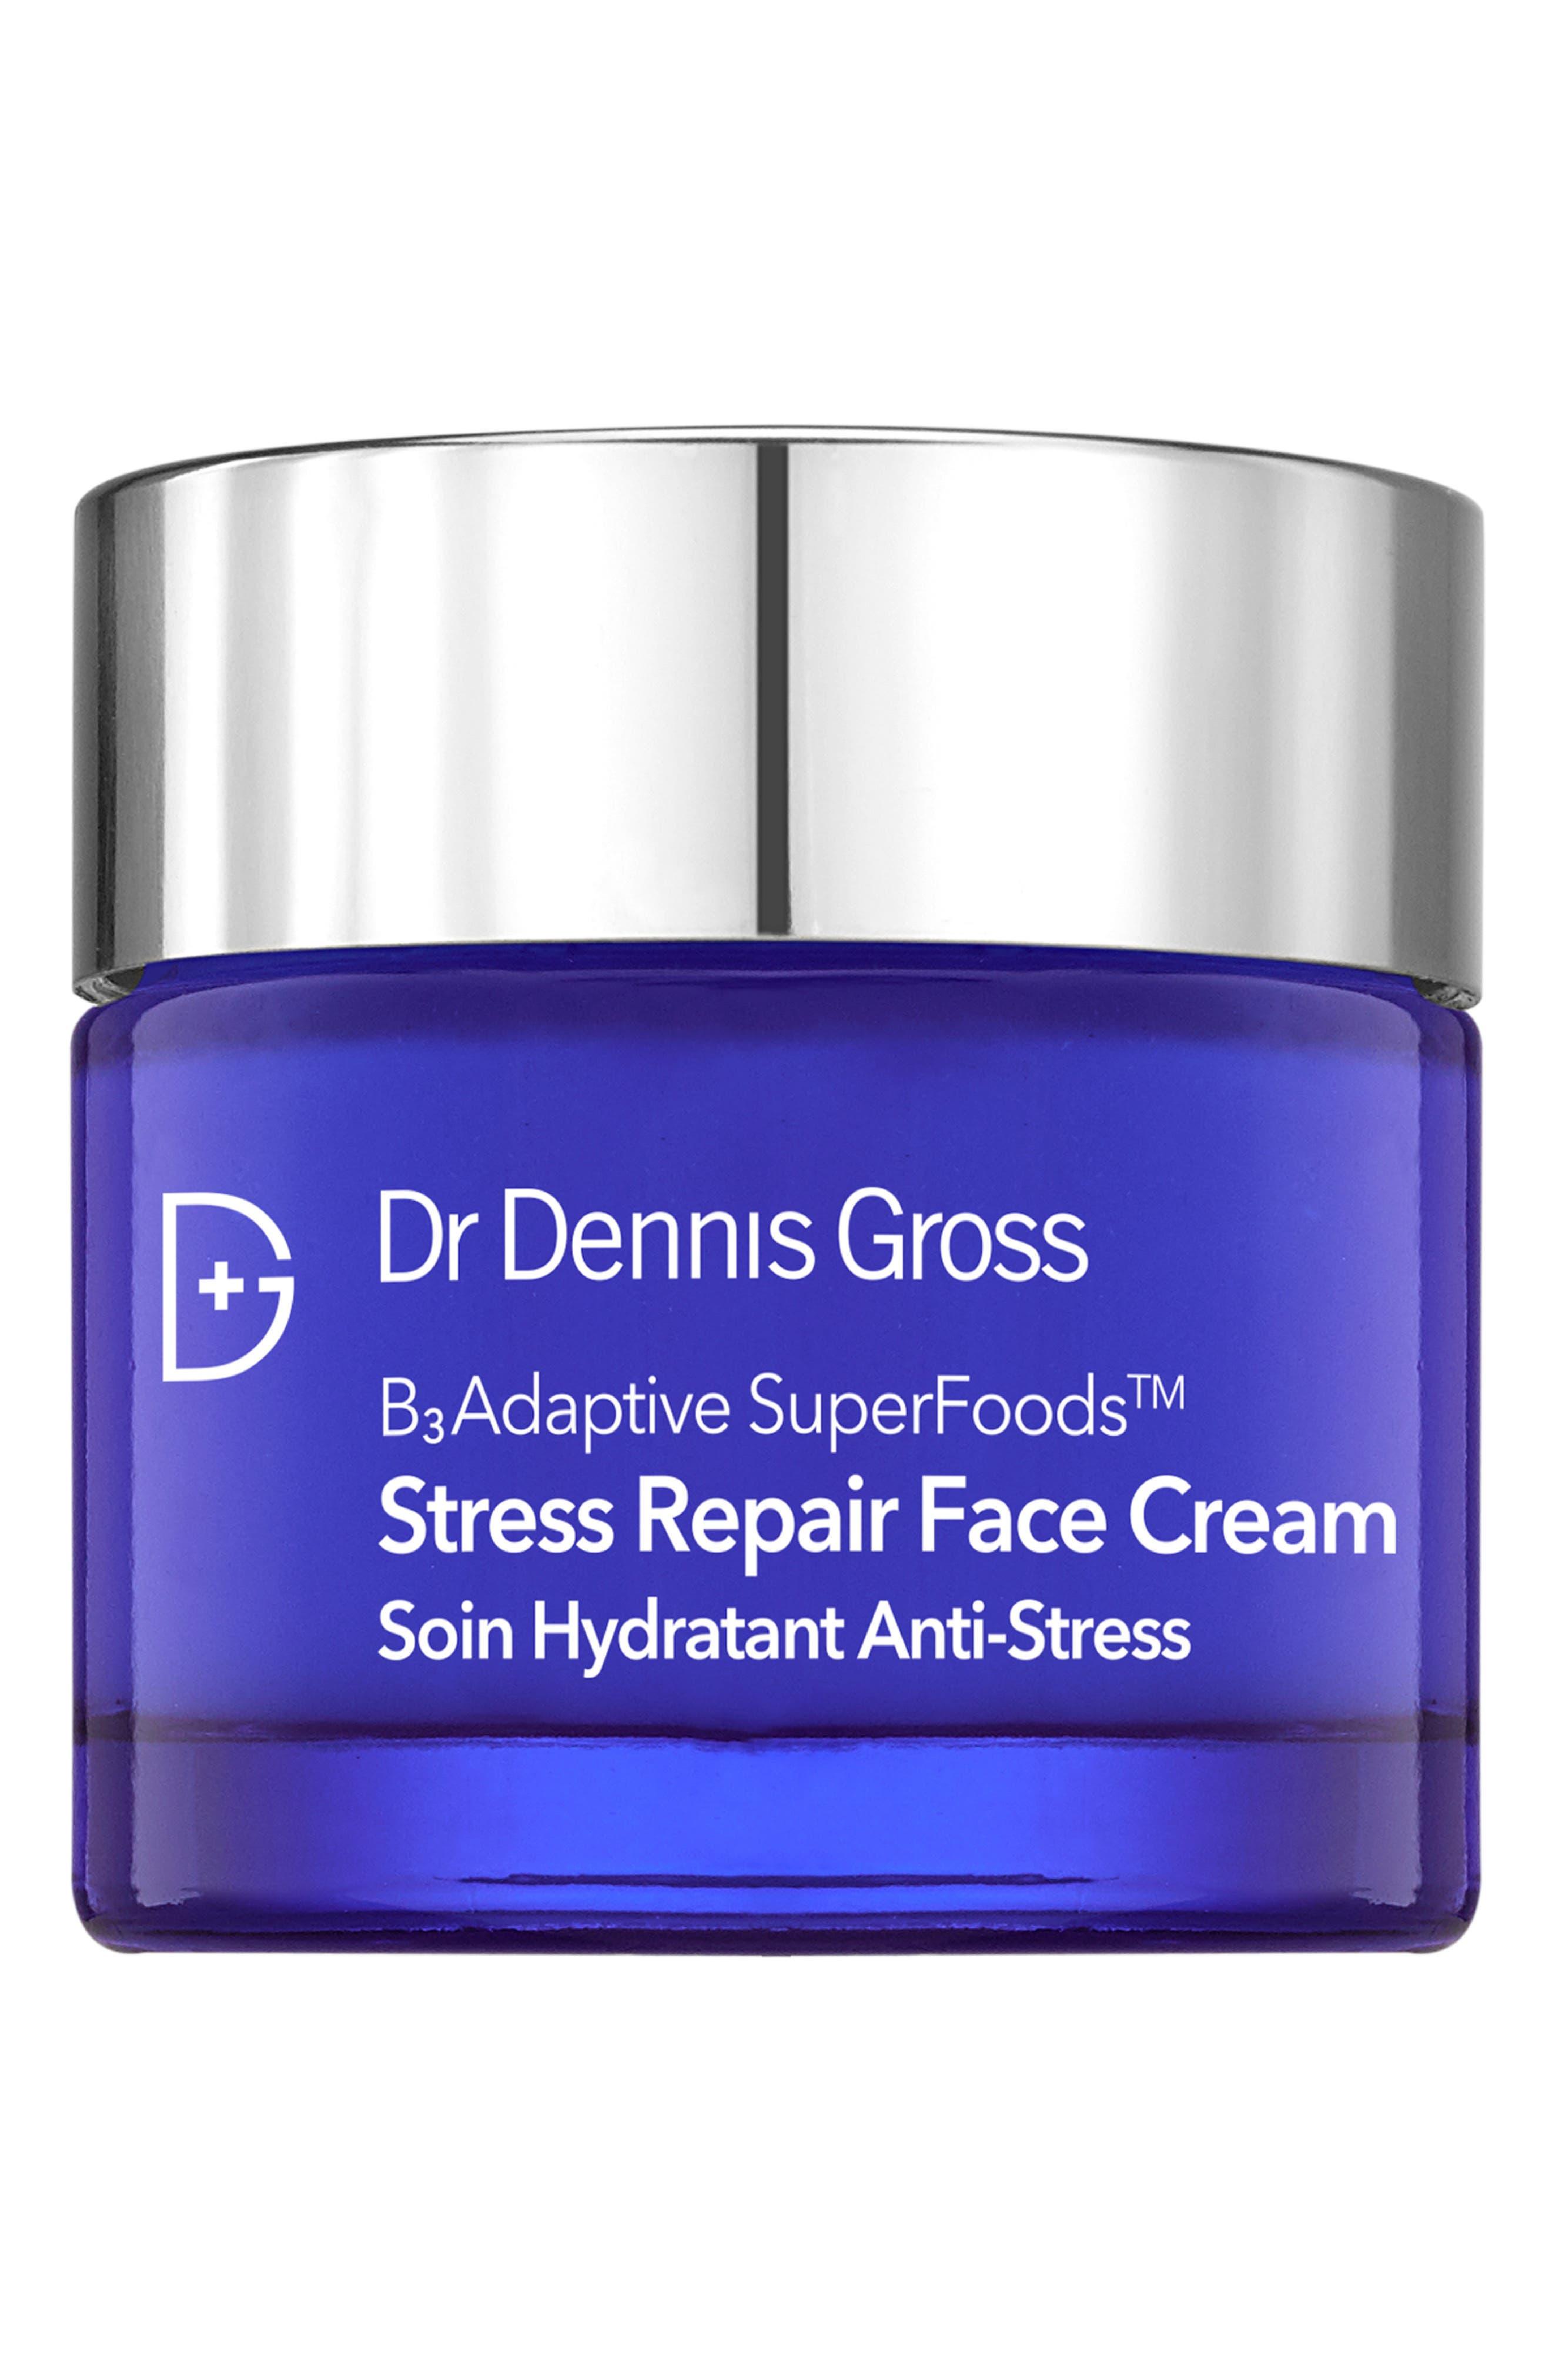 Skincare B3Adaptive Superfoods(TM) Stress Repair Face Cream